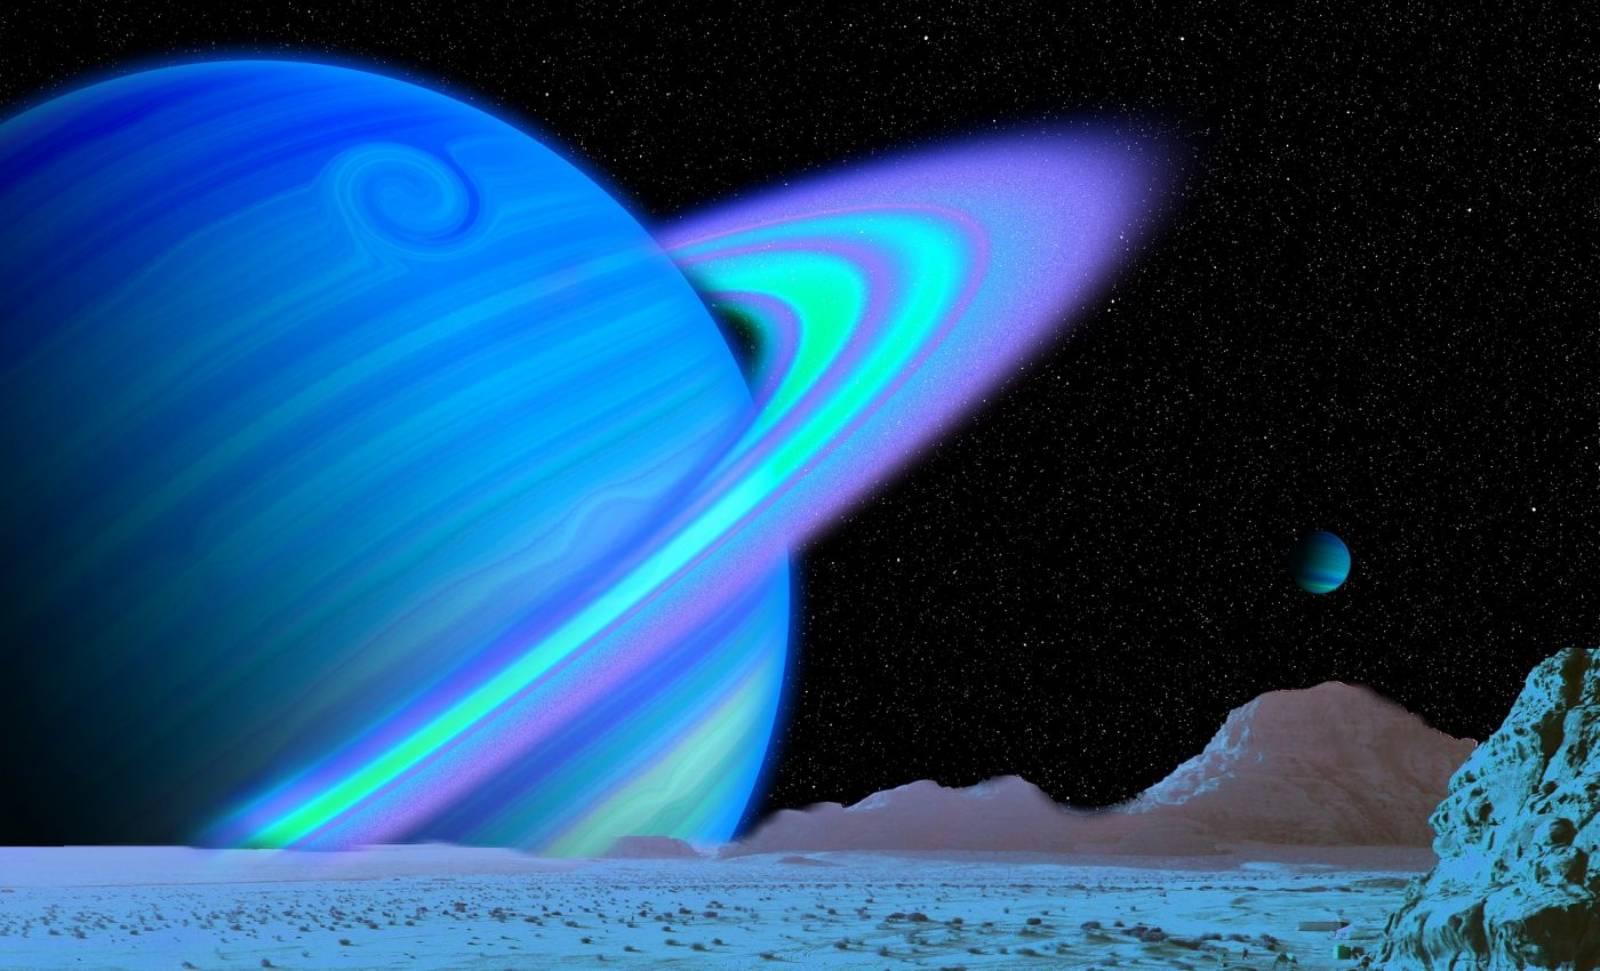 Nearby Planet Uranus